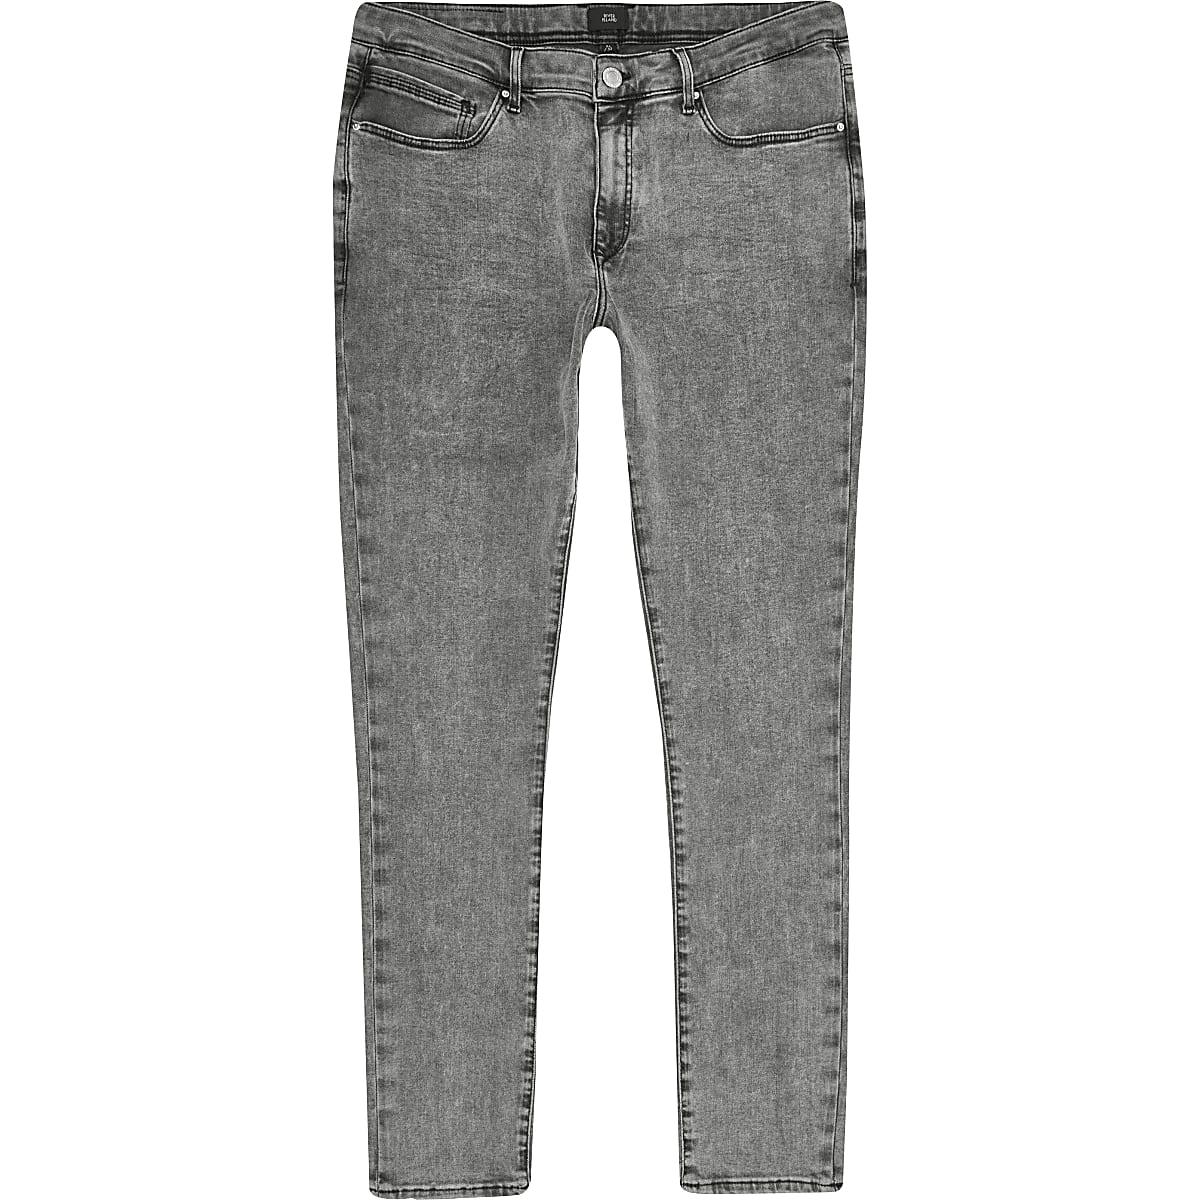 Grey Danny super skinny jeans